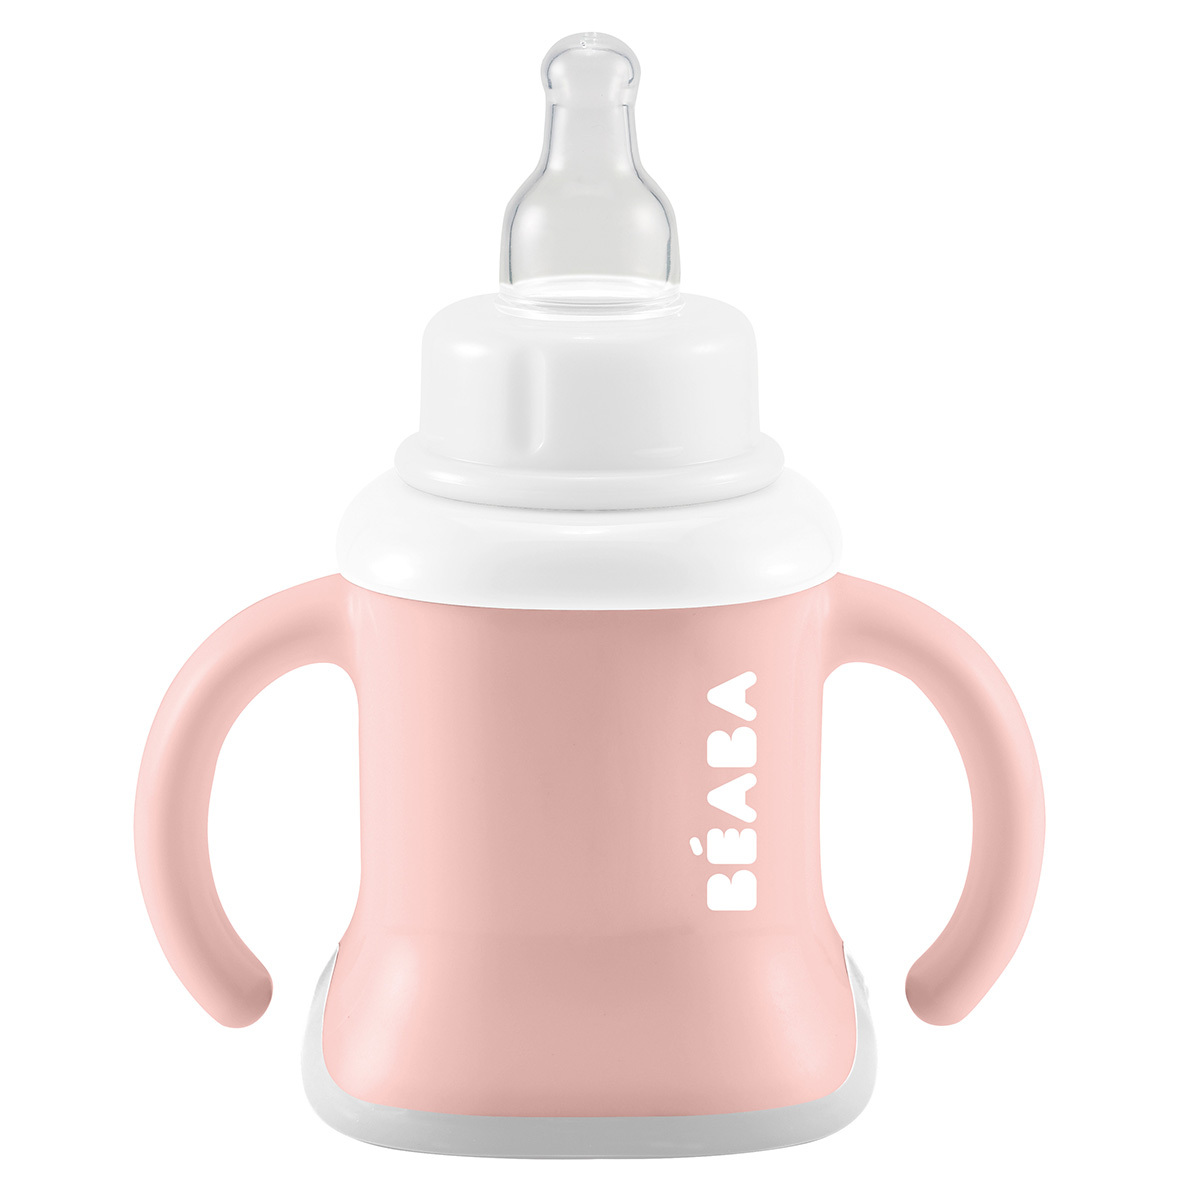 Tasse & Verre Tasse Evoluclip 3-en-1 Old Pink - 150 ml Tasse Evoluclip 3-en-1 Old Pink - 150 ml